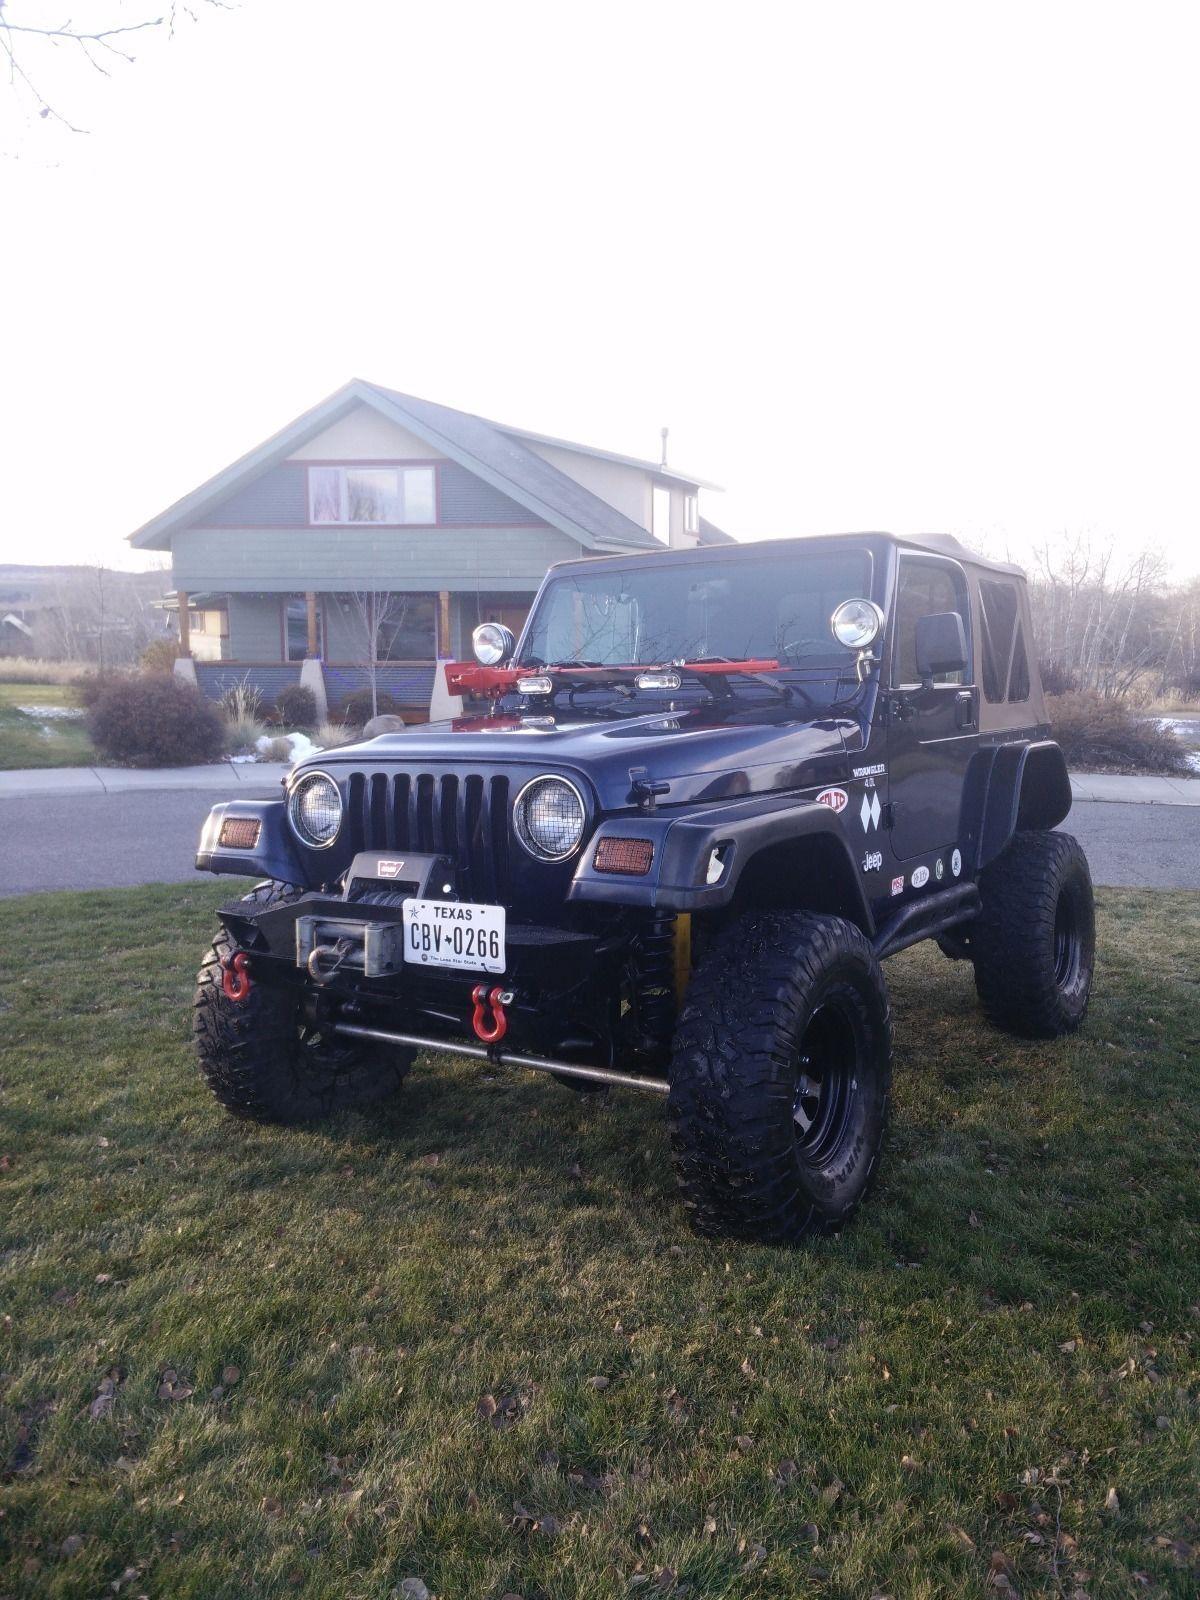 Garaged 1997 Jeep Wrangler Monster For Sale